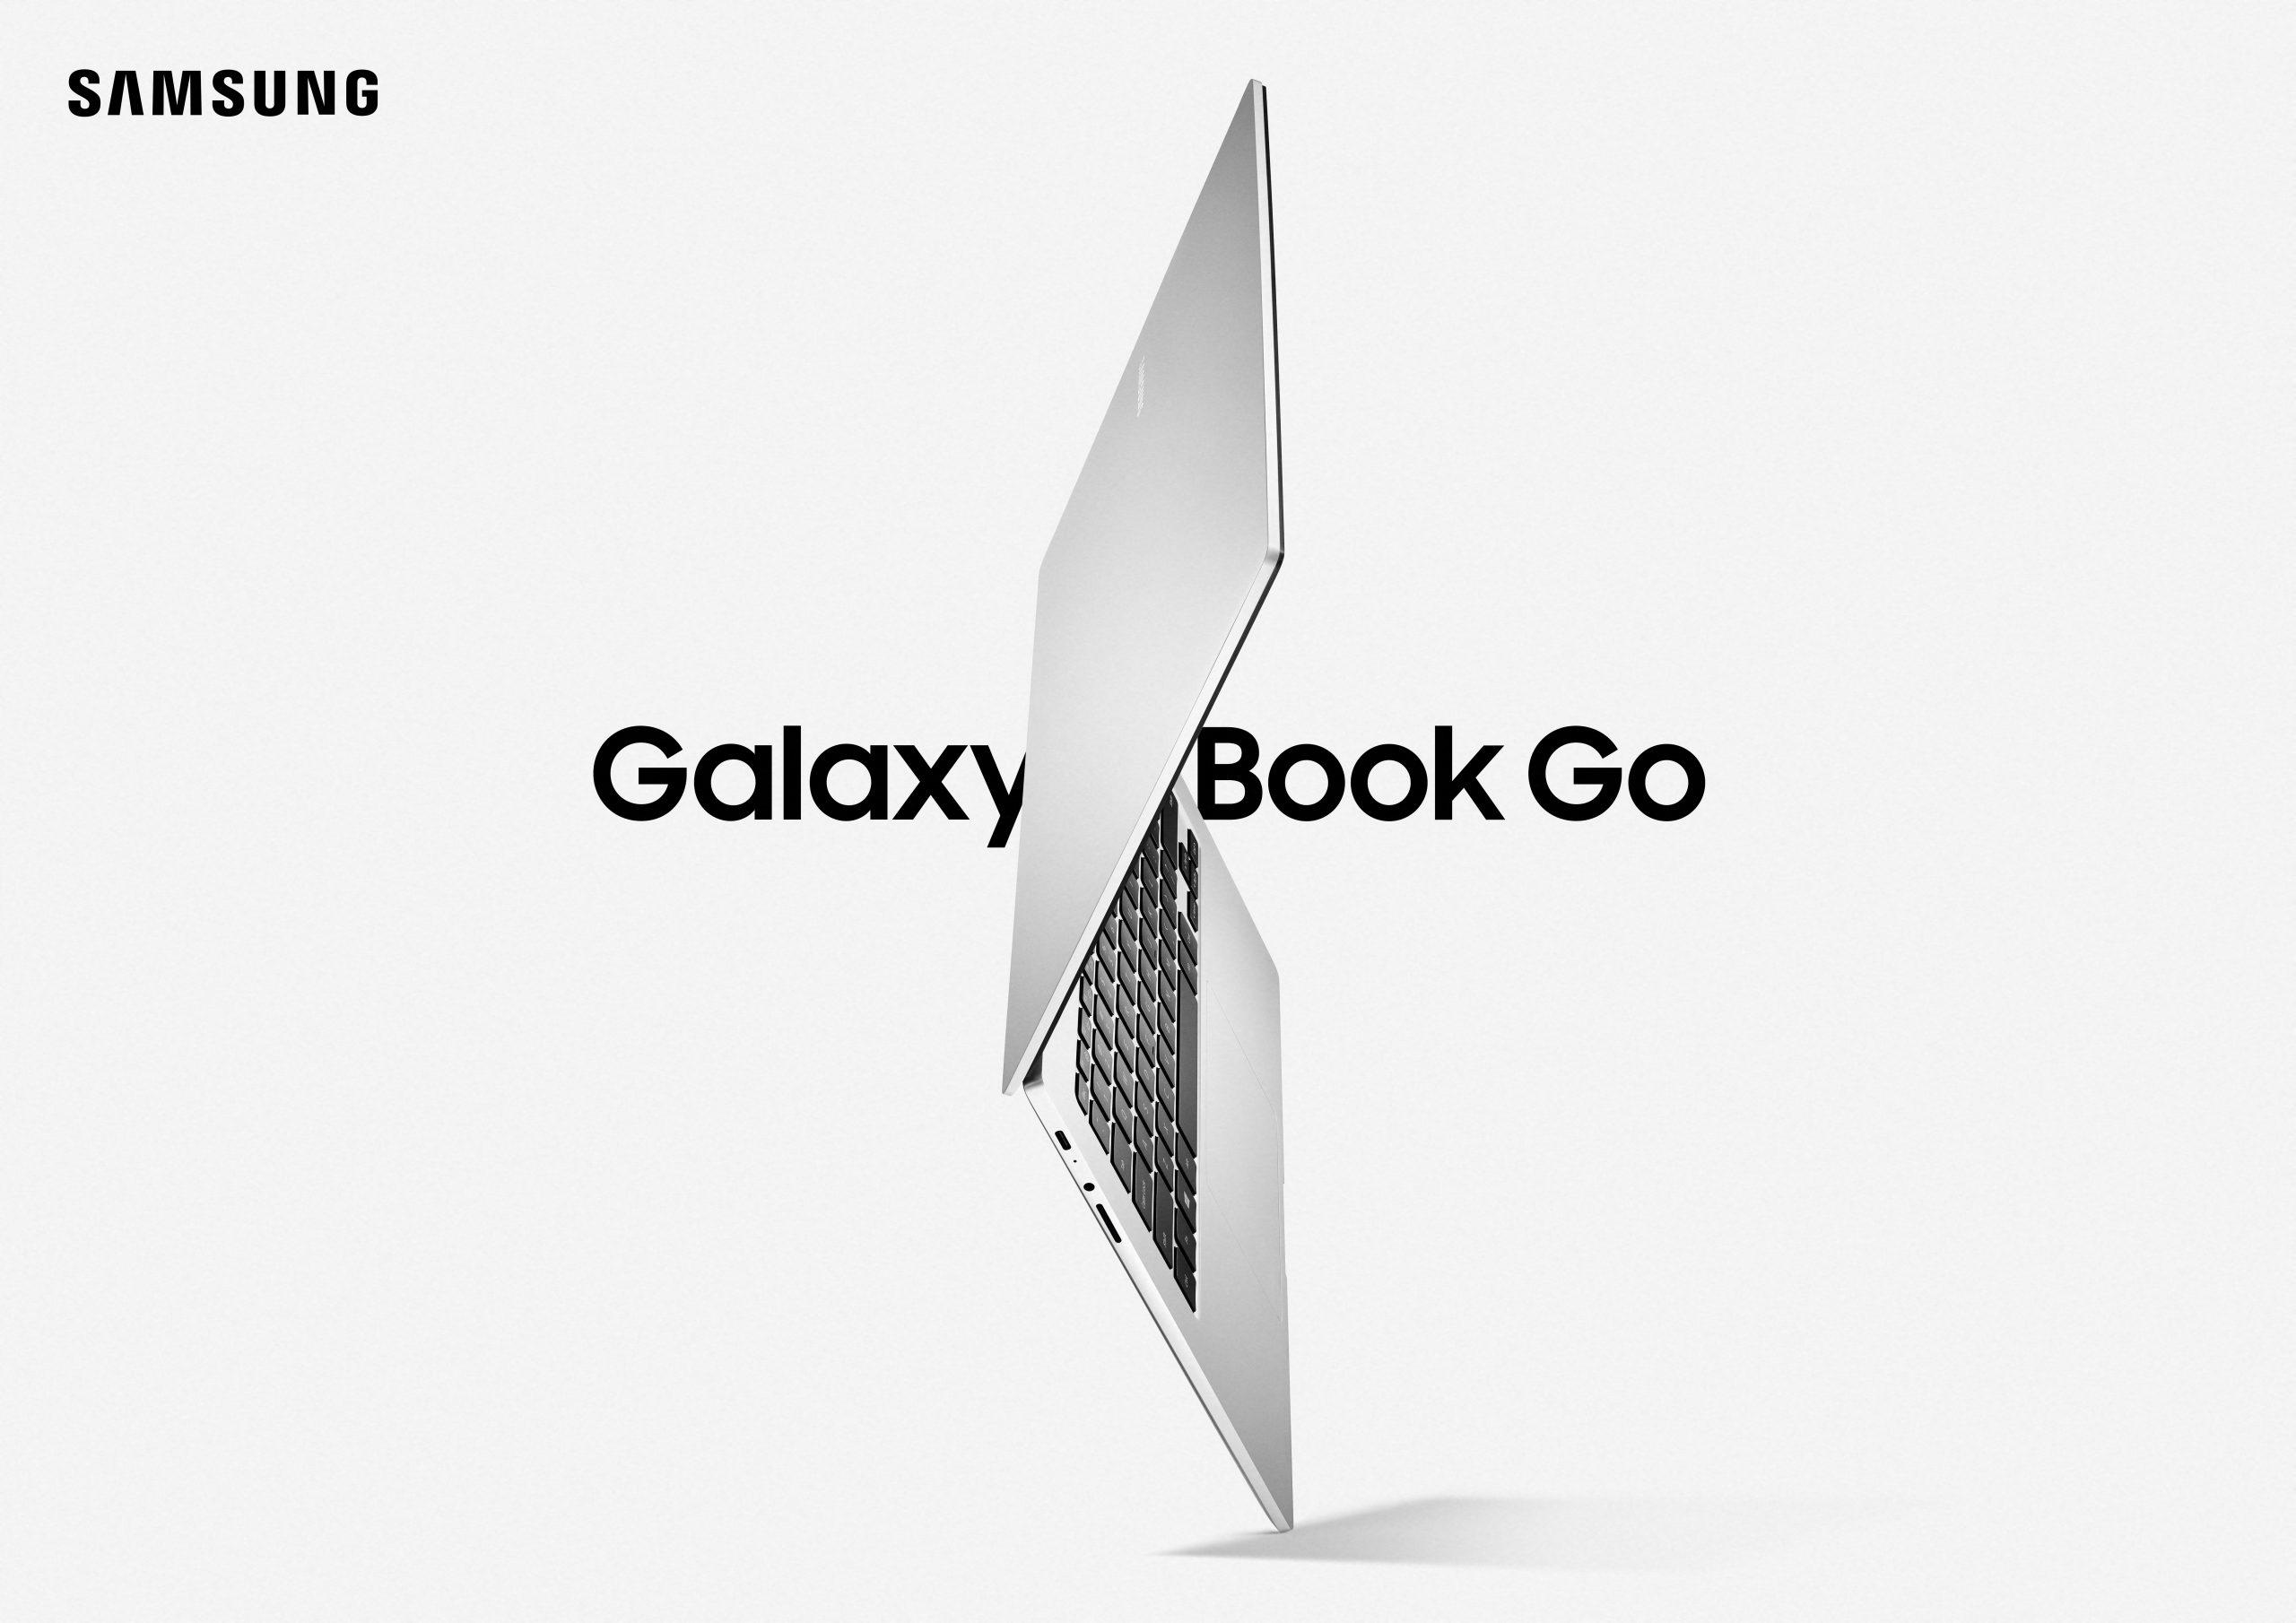 Galaxy Book Go